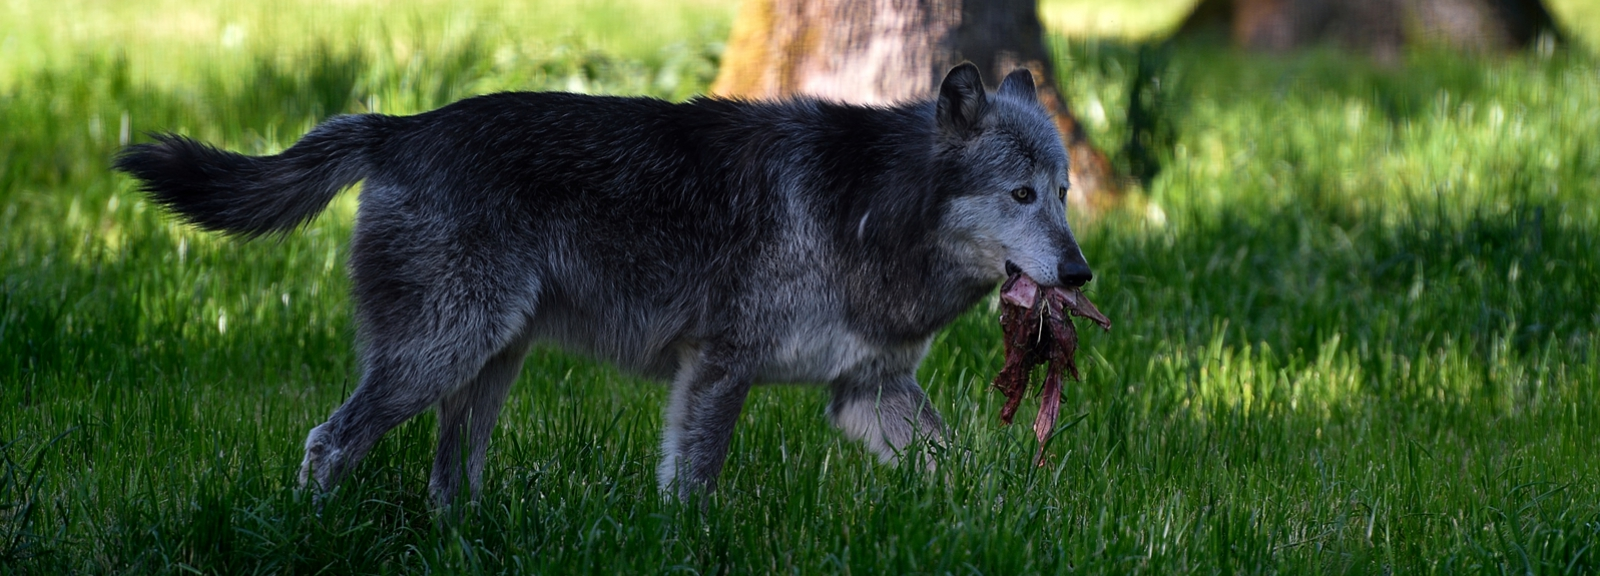 Loup de Mackenzie © MNHN - F-G Grandin